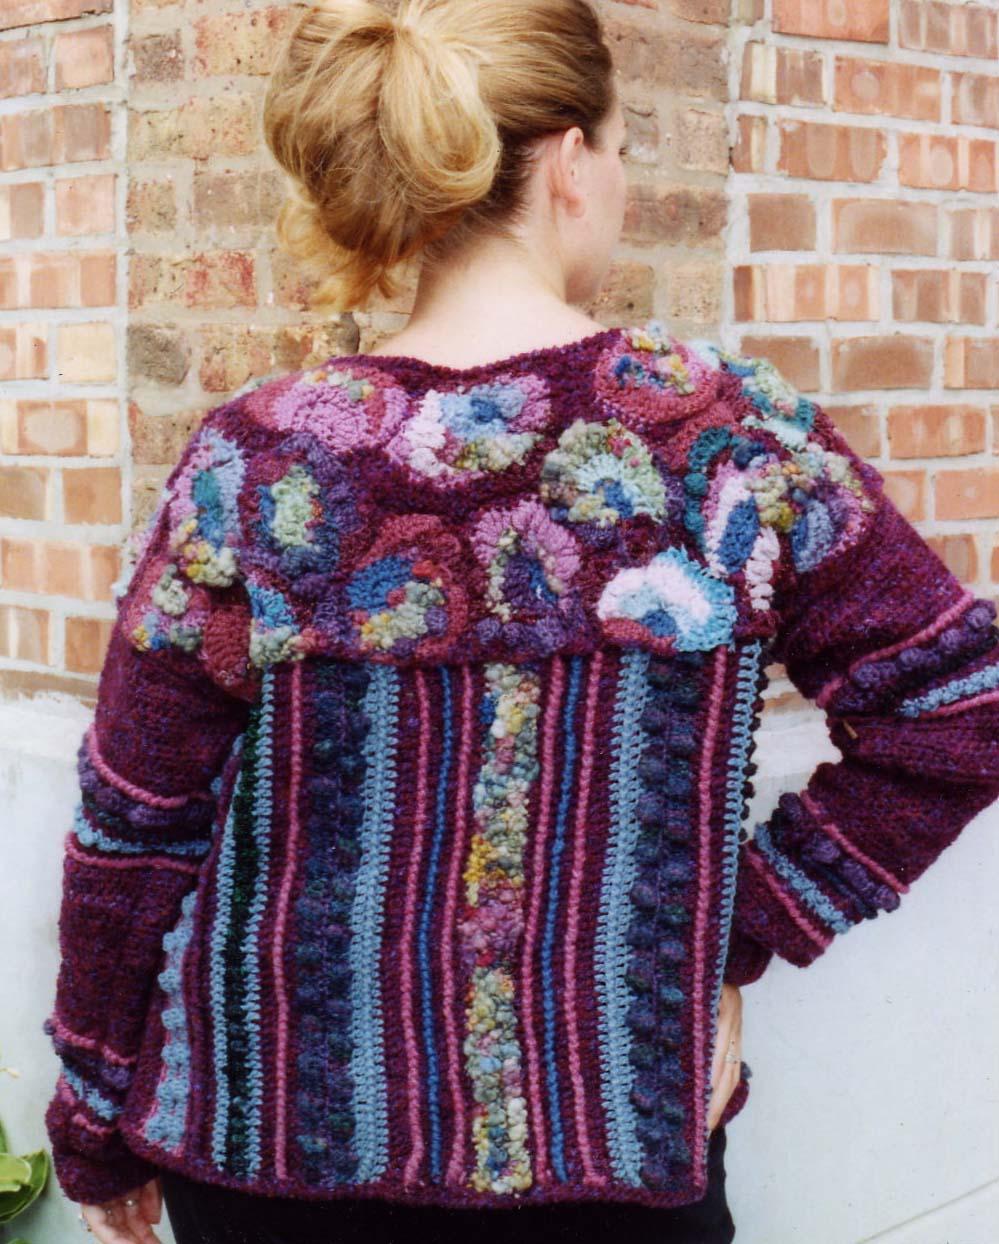 Crochet Queen : Crochet Queen: Royal Ramblings: International Free Form Crochet Guild